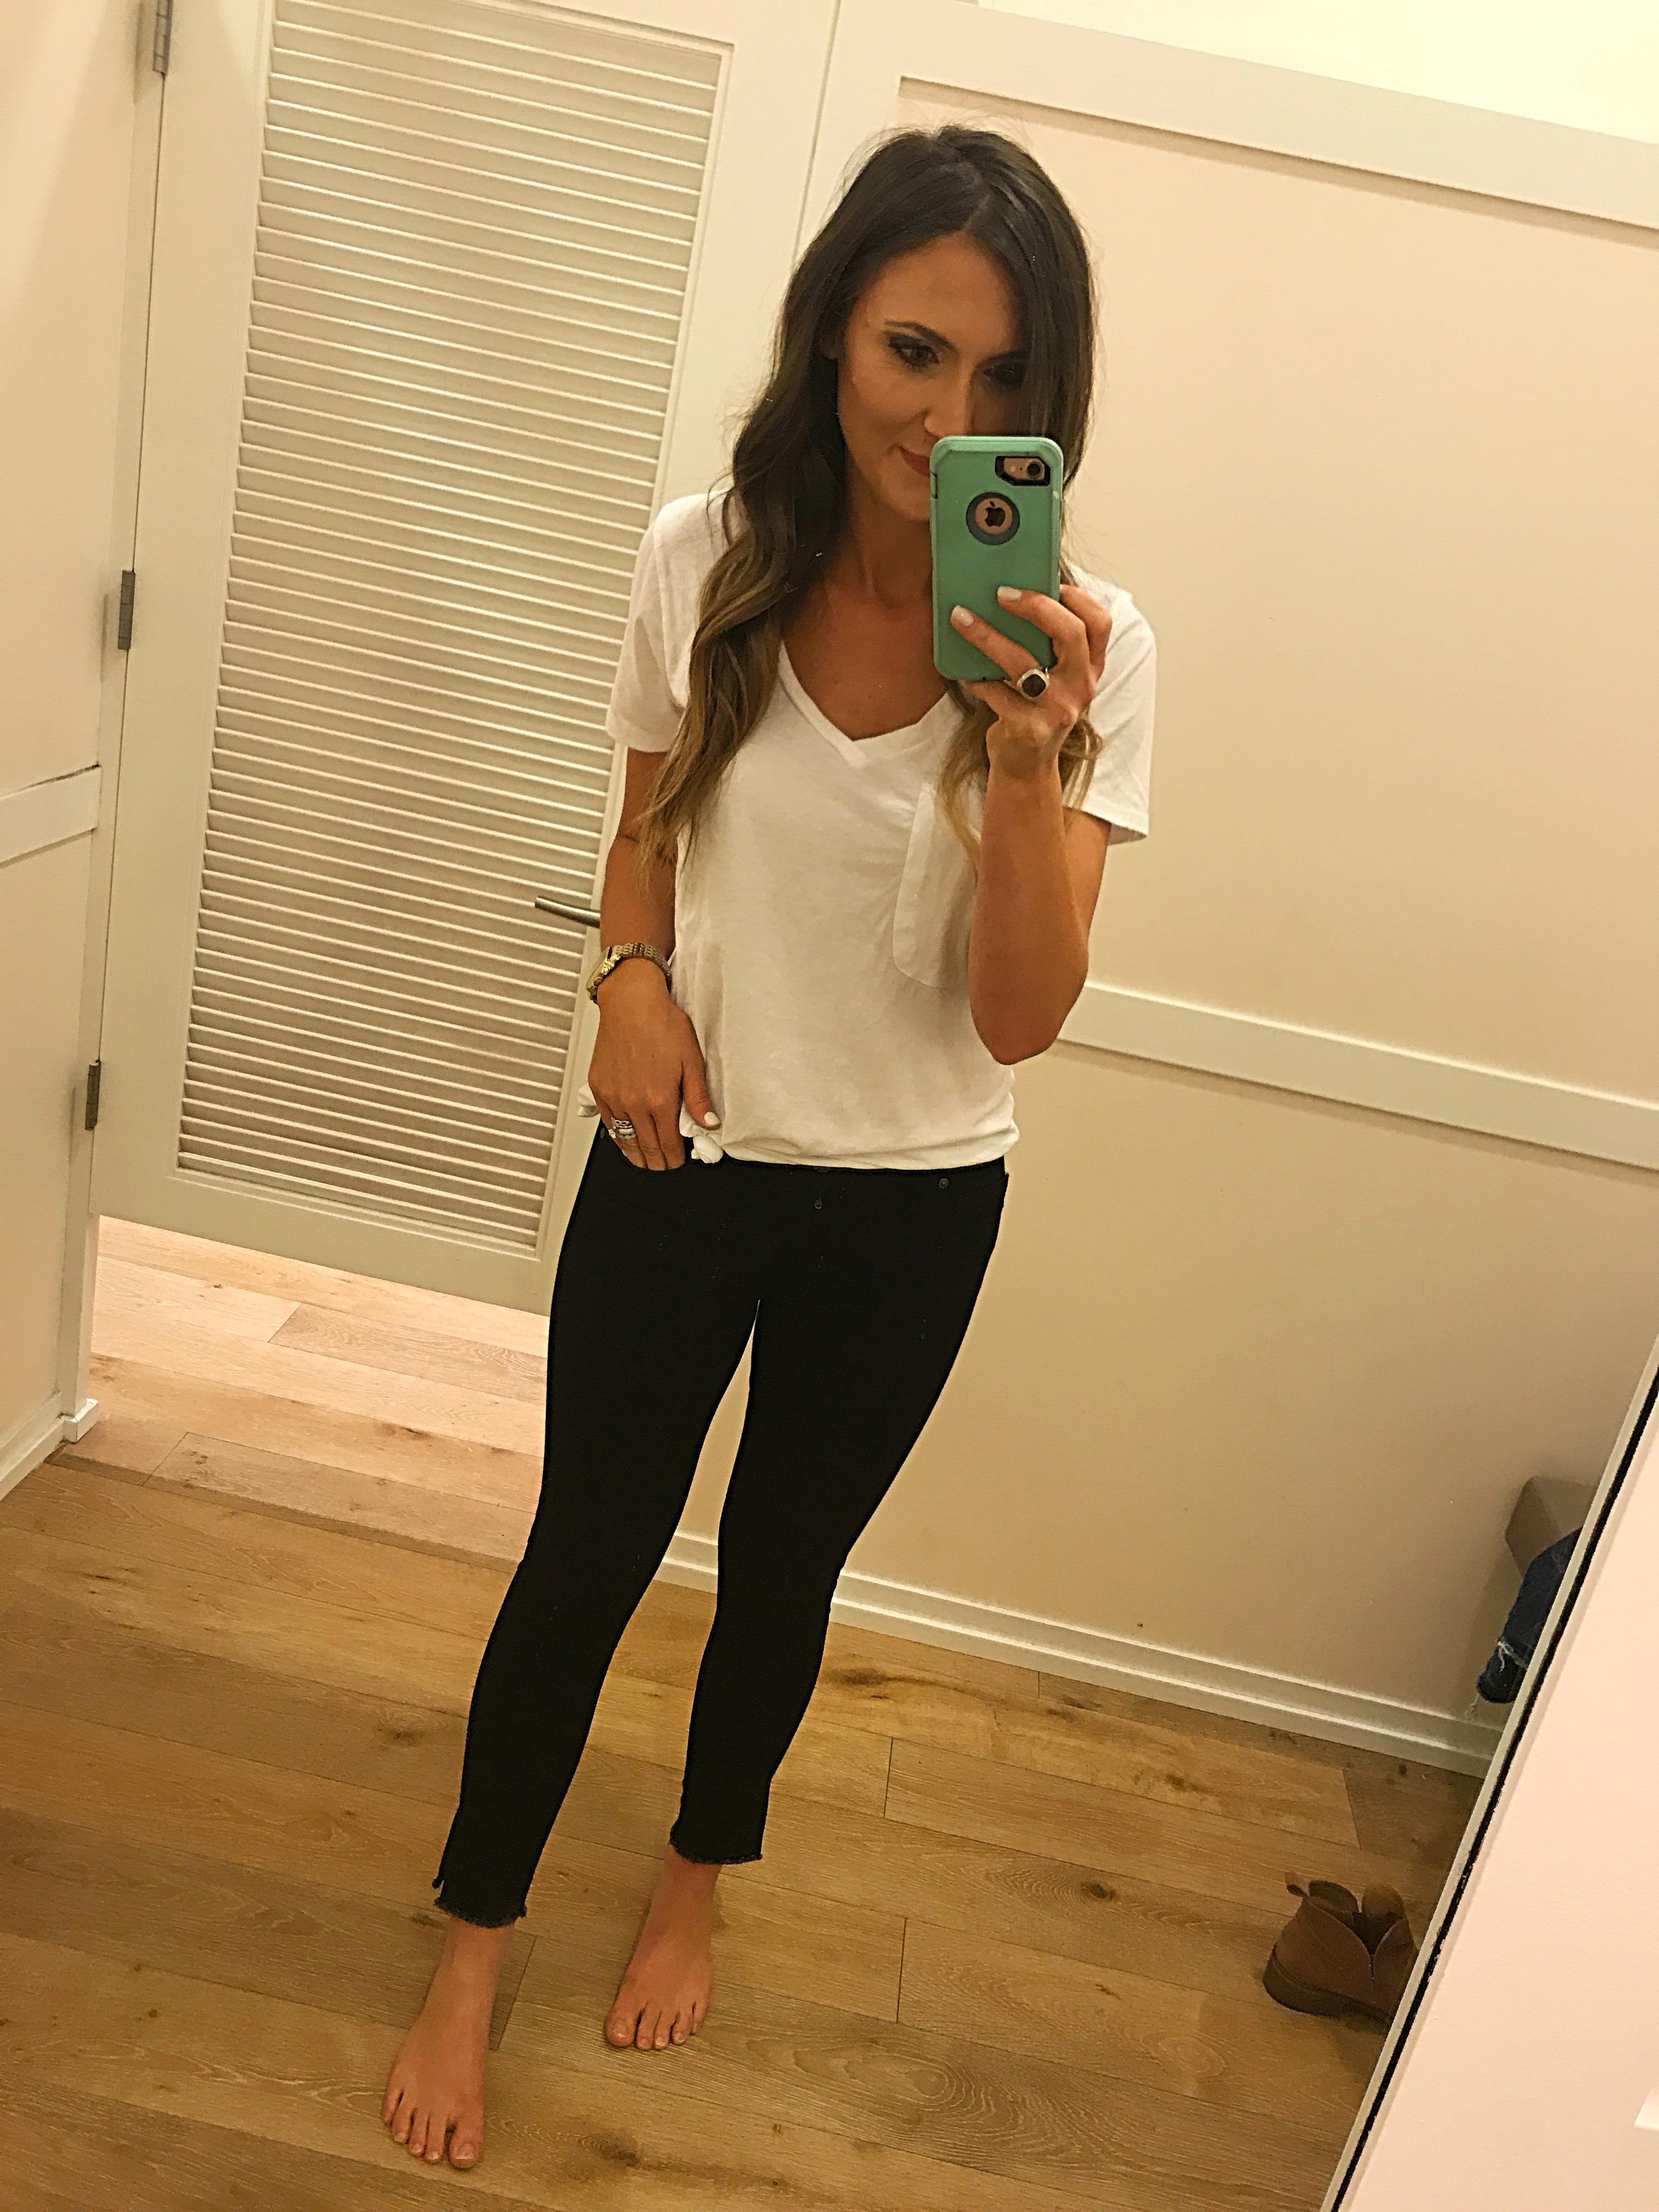 LOFT Modern skinny black jeans fit review